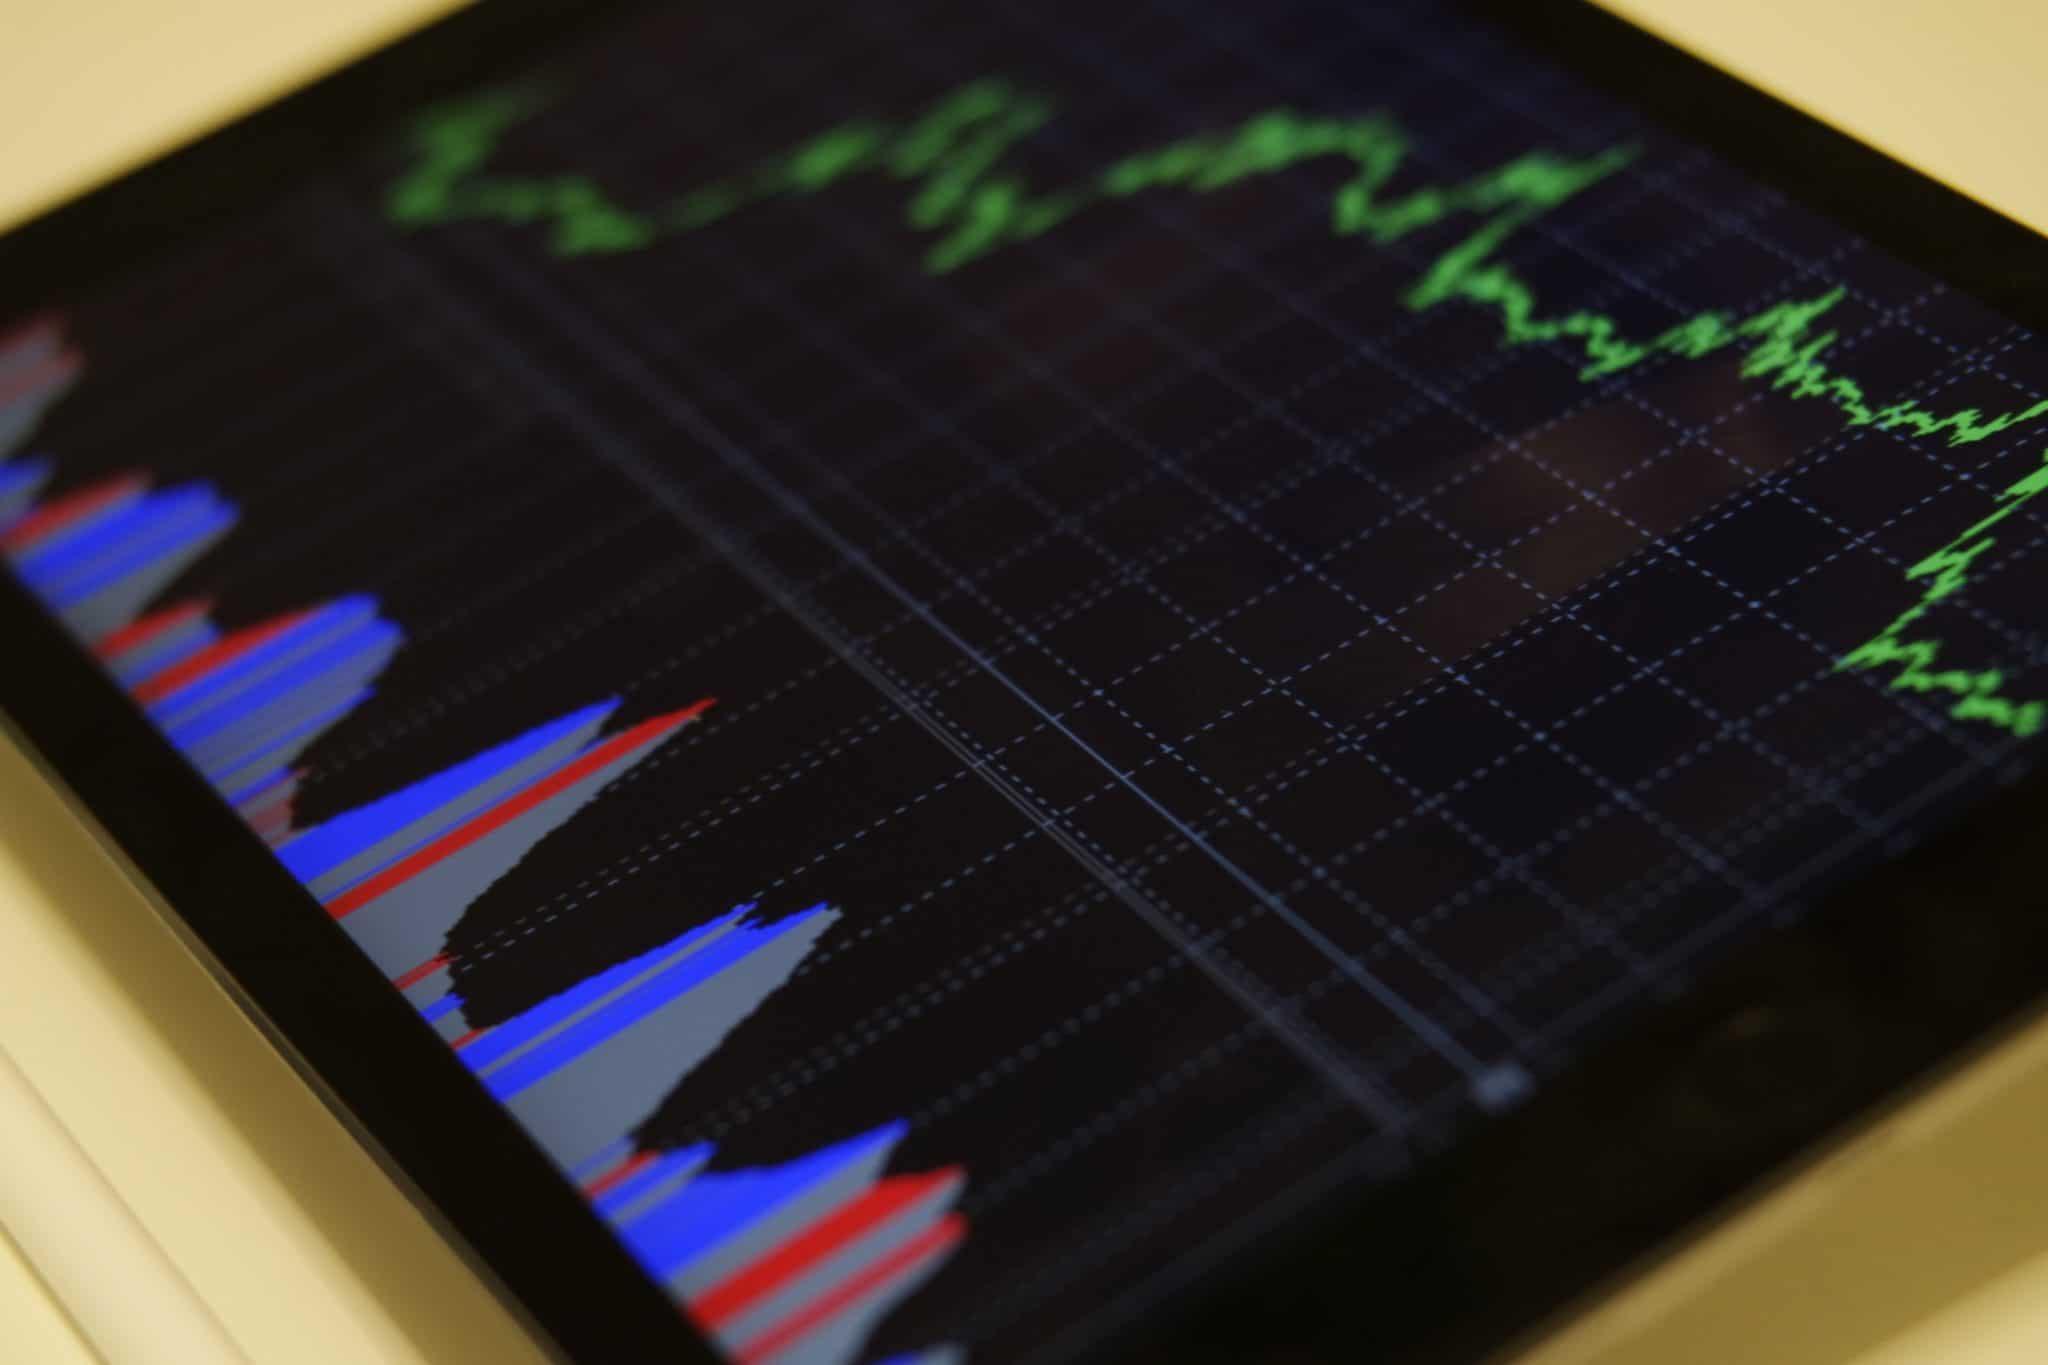 iPad showing financial graphs